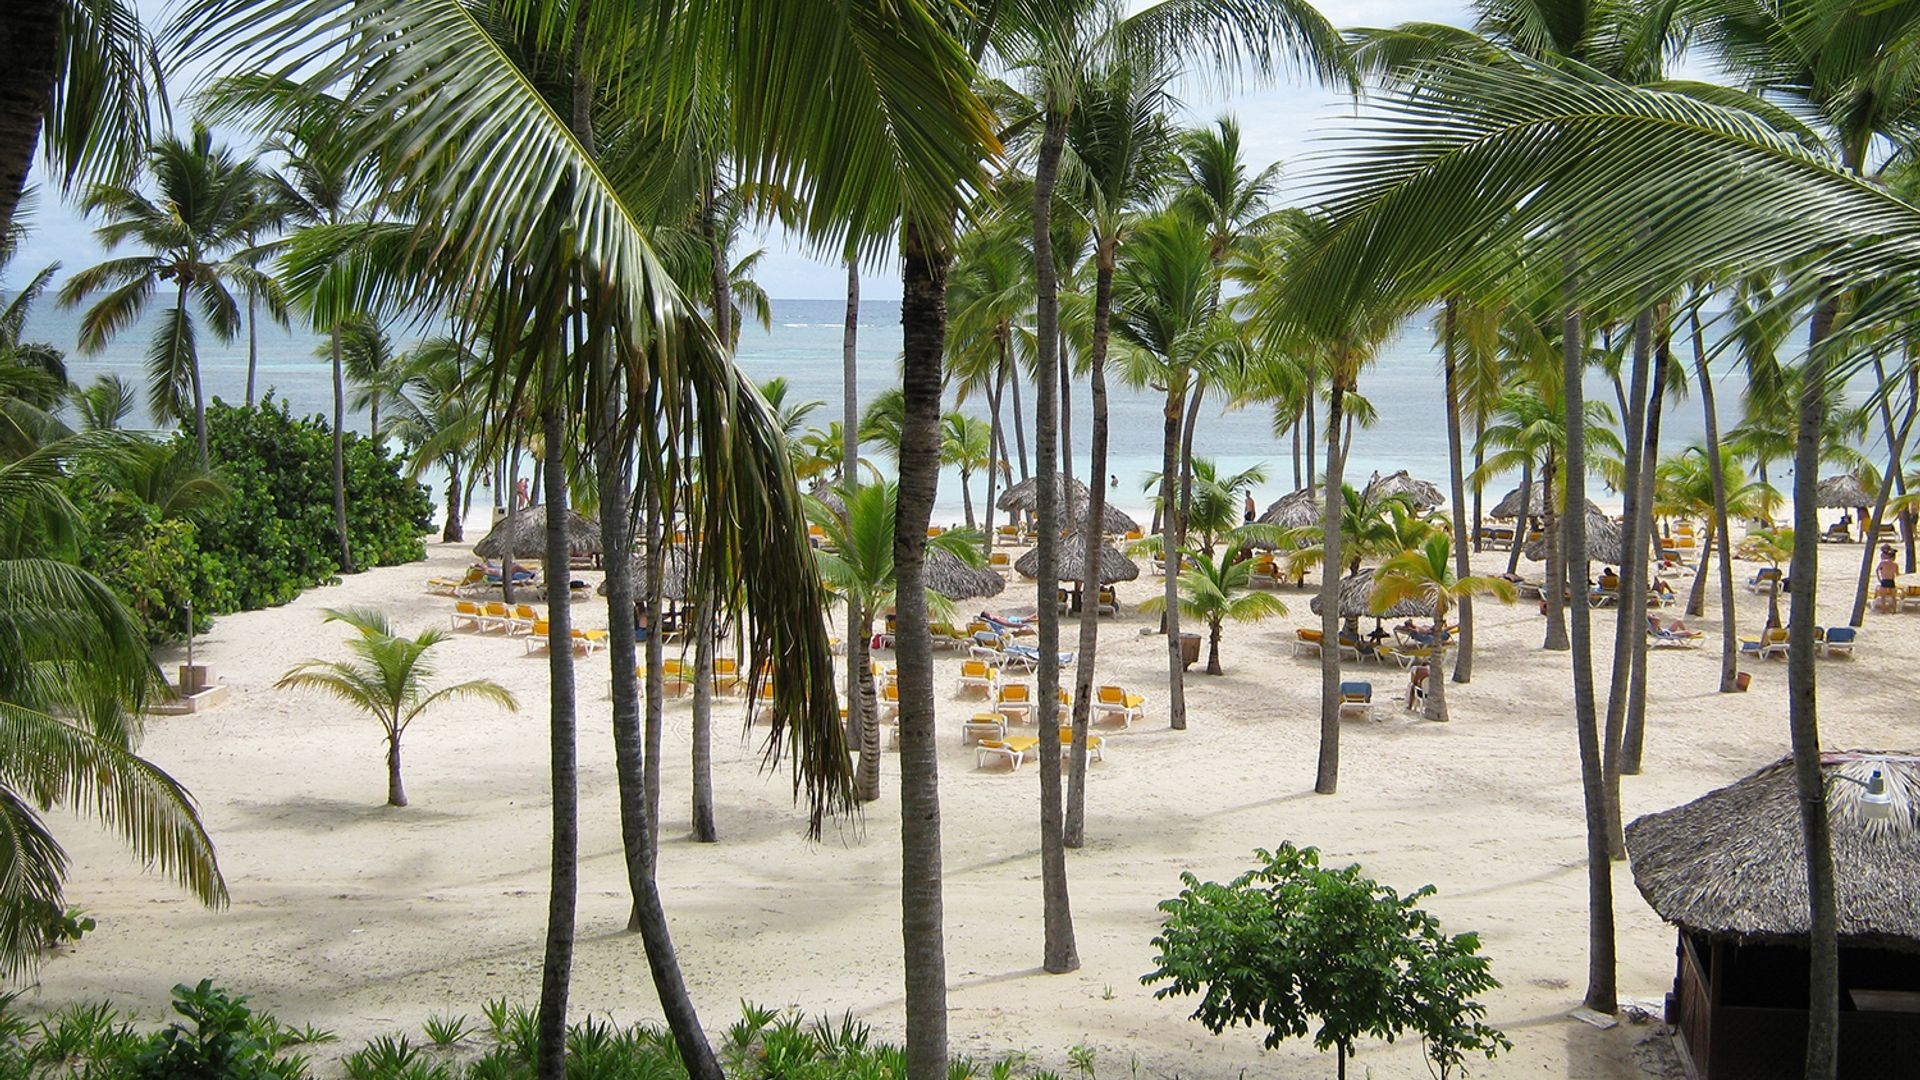 Sejur plaja Punta Cana, 11 zile - aprilie 2022